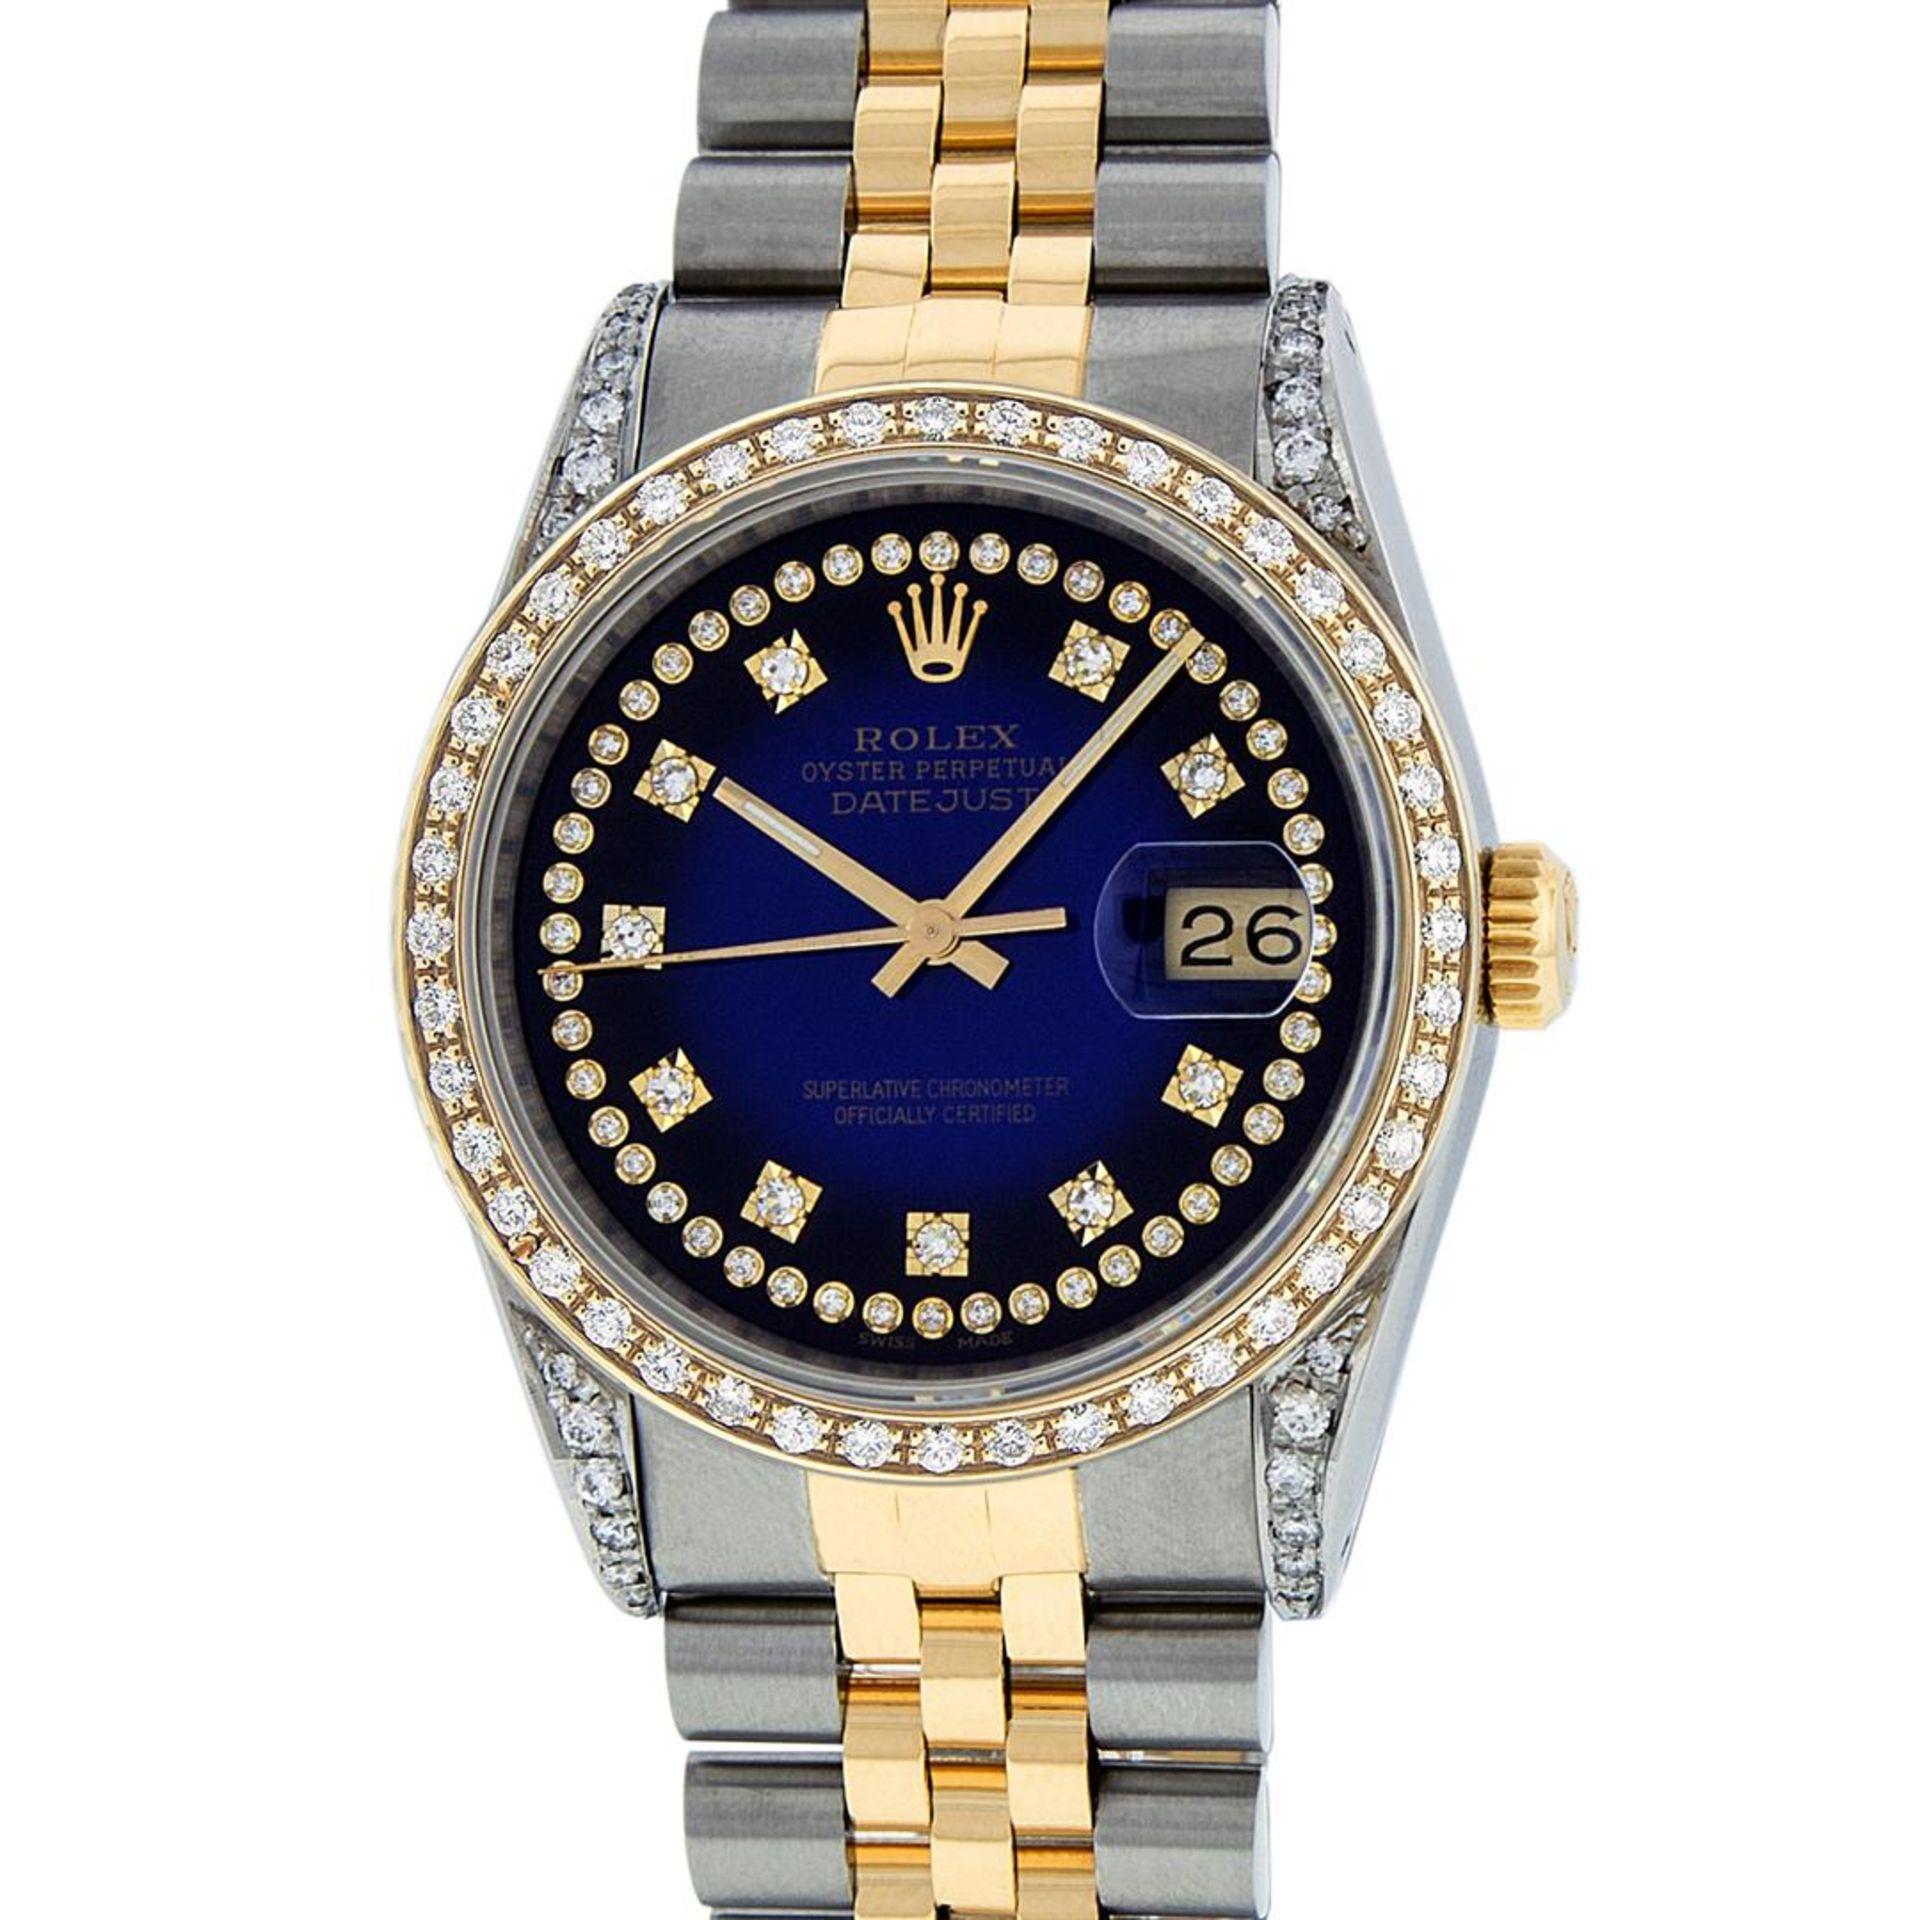 Rolex Mens 2 Tone Blue Vignette String Diamond Lugs Datejust Wristwatch - Image 2 of 8